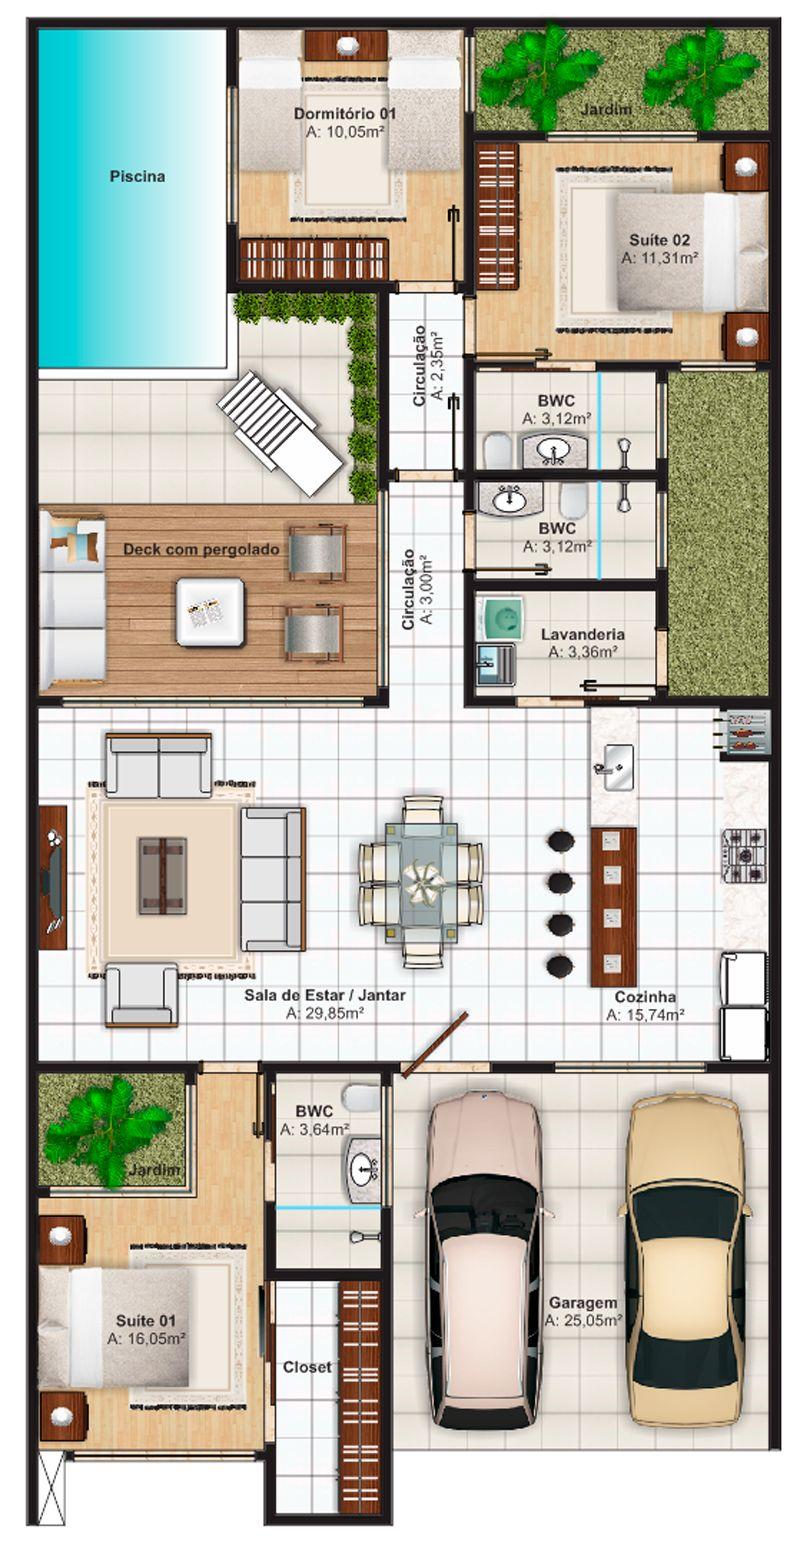 Projeto arquitet nico casa campinas c d 106 r 598 for Layout di una casa di una storia